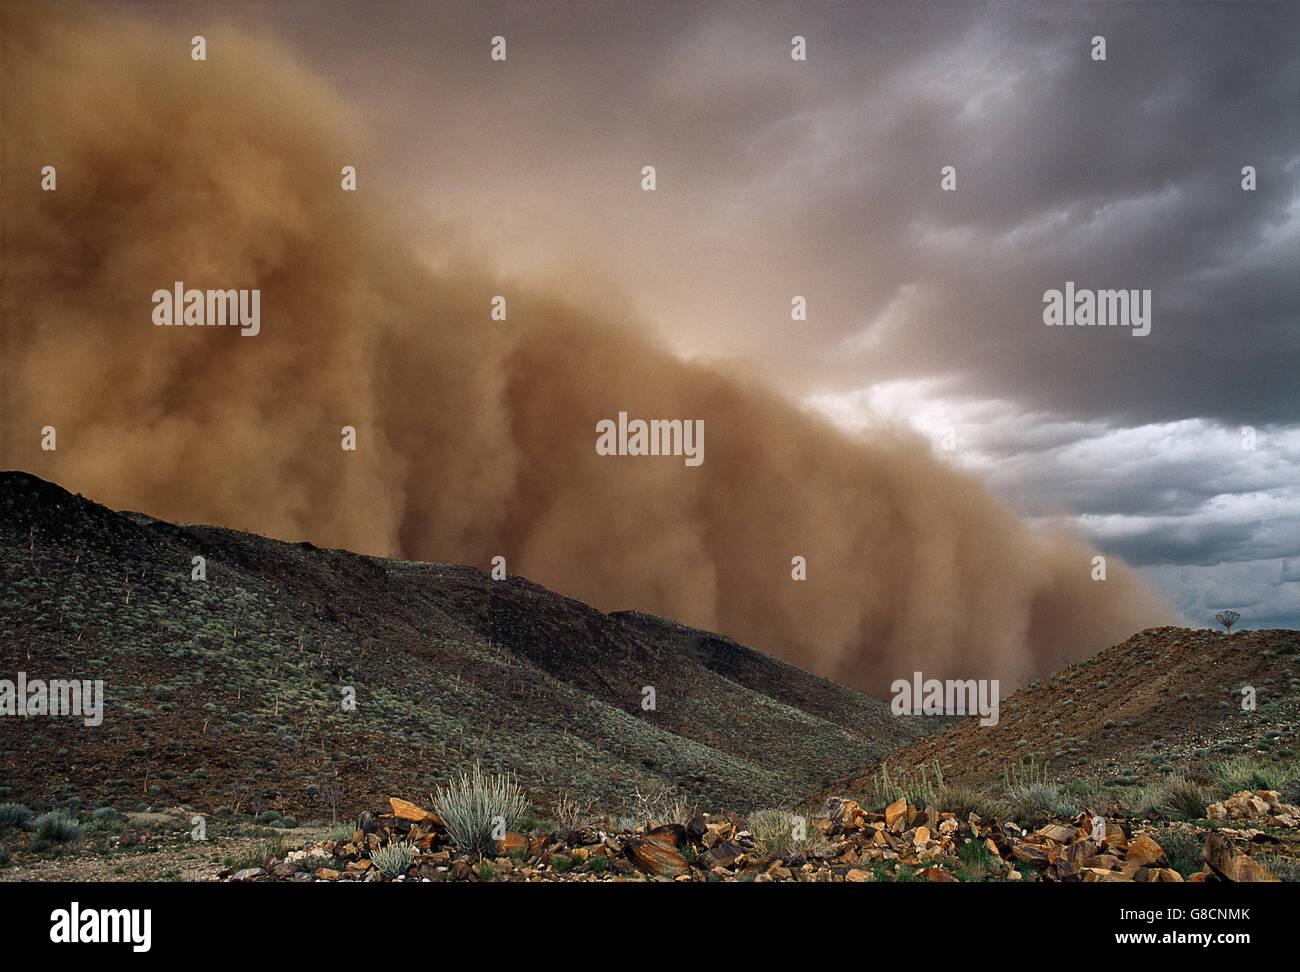 Sandstorm, Namib Desert, Namibia. - Stock Image